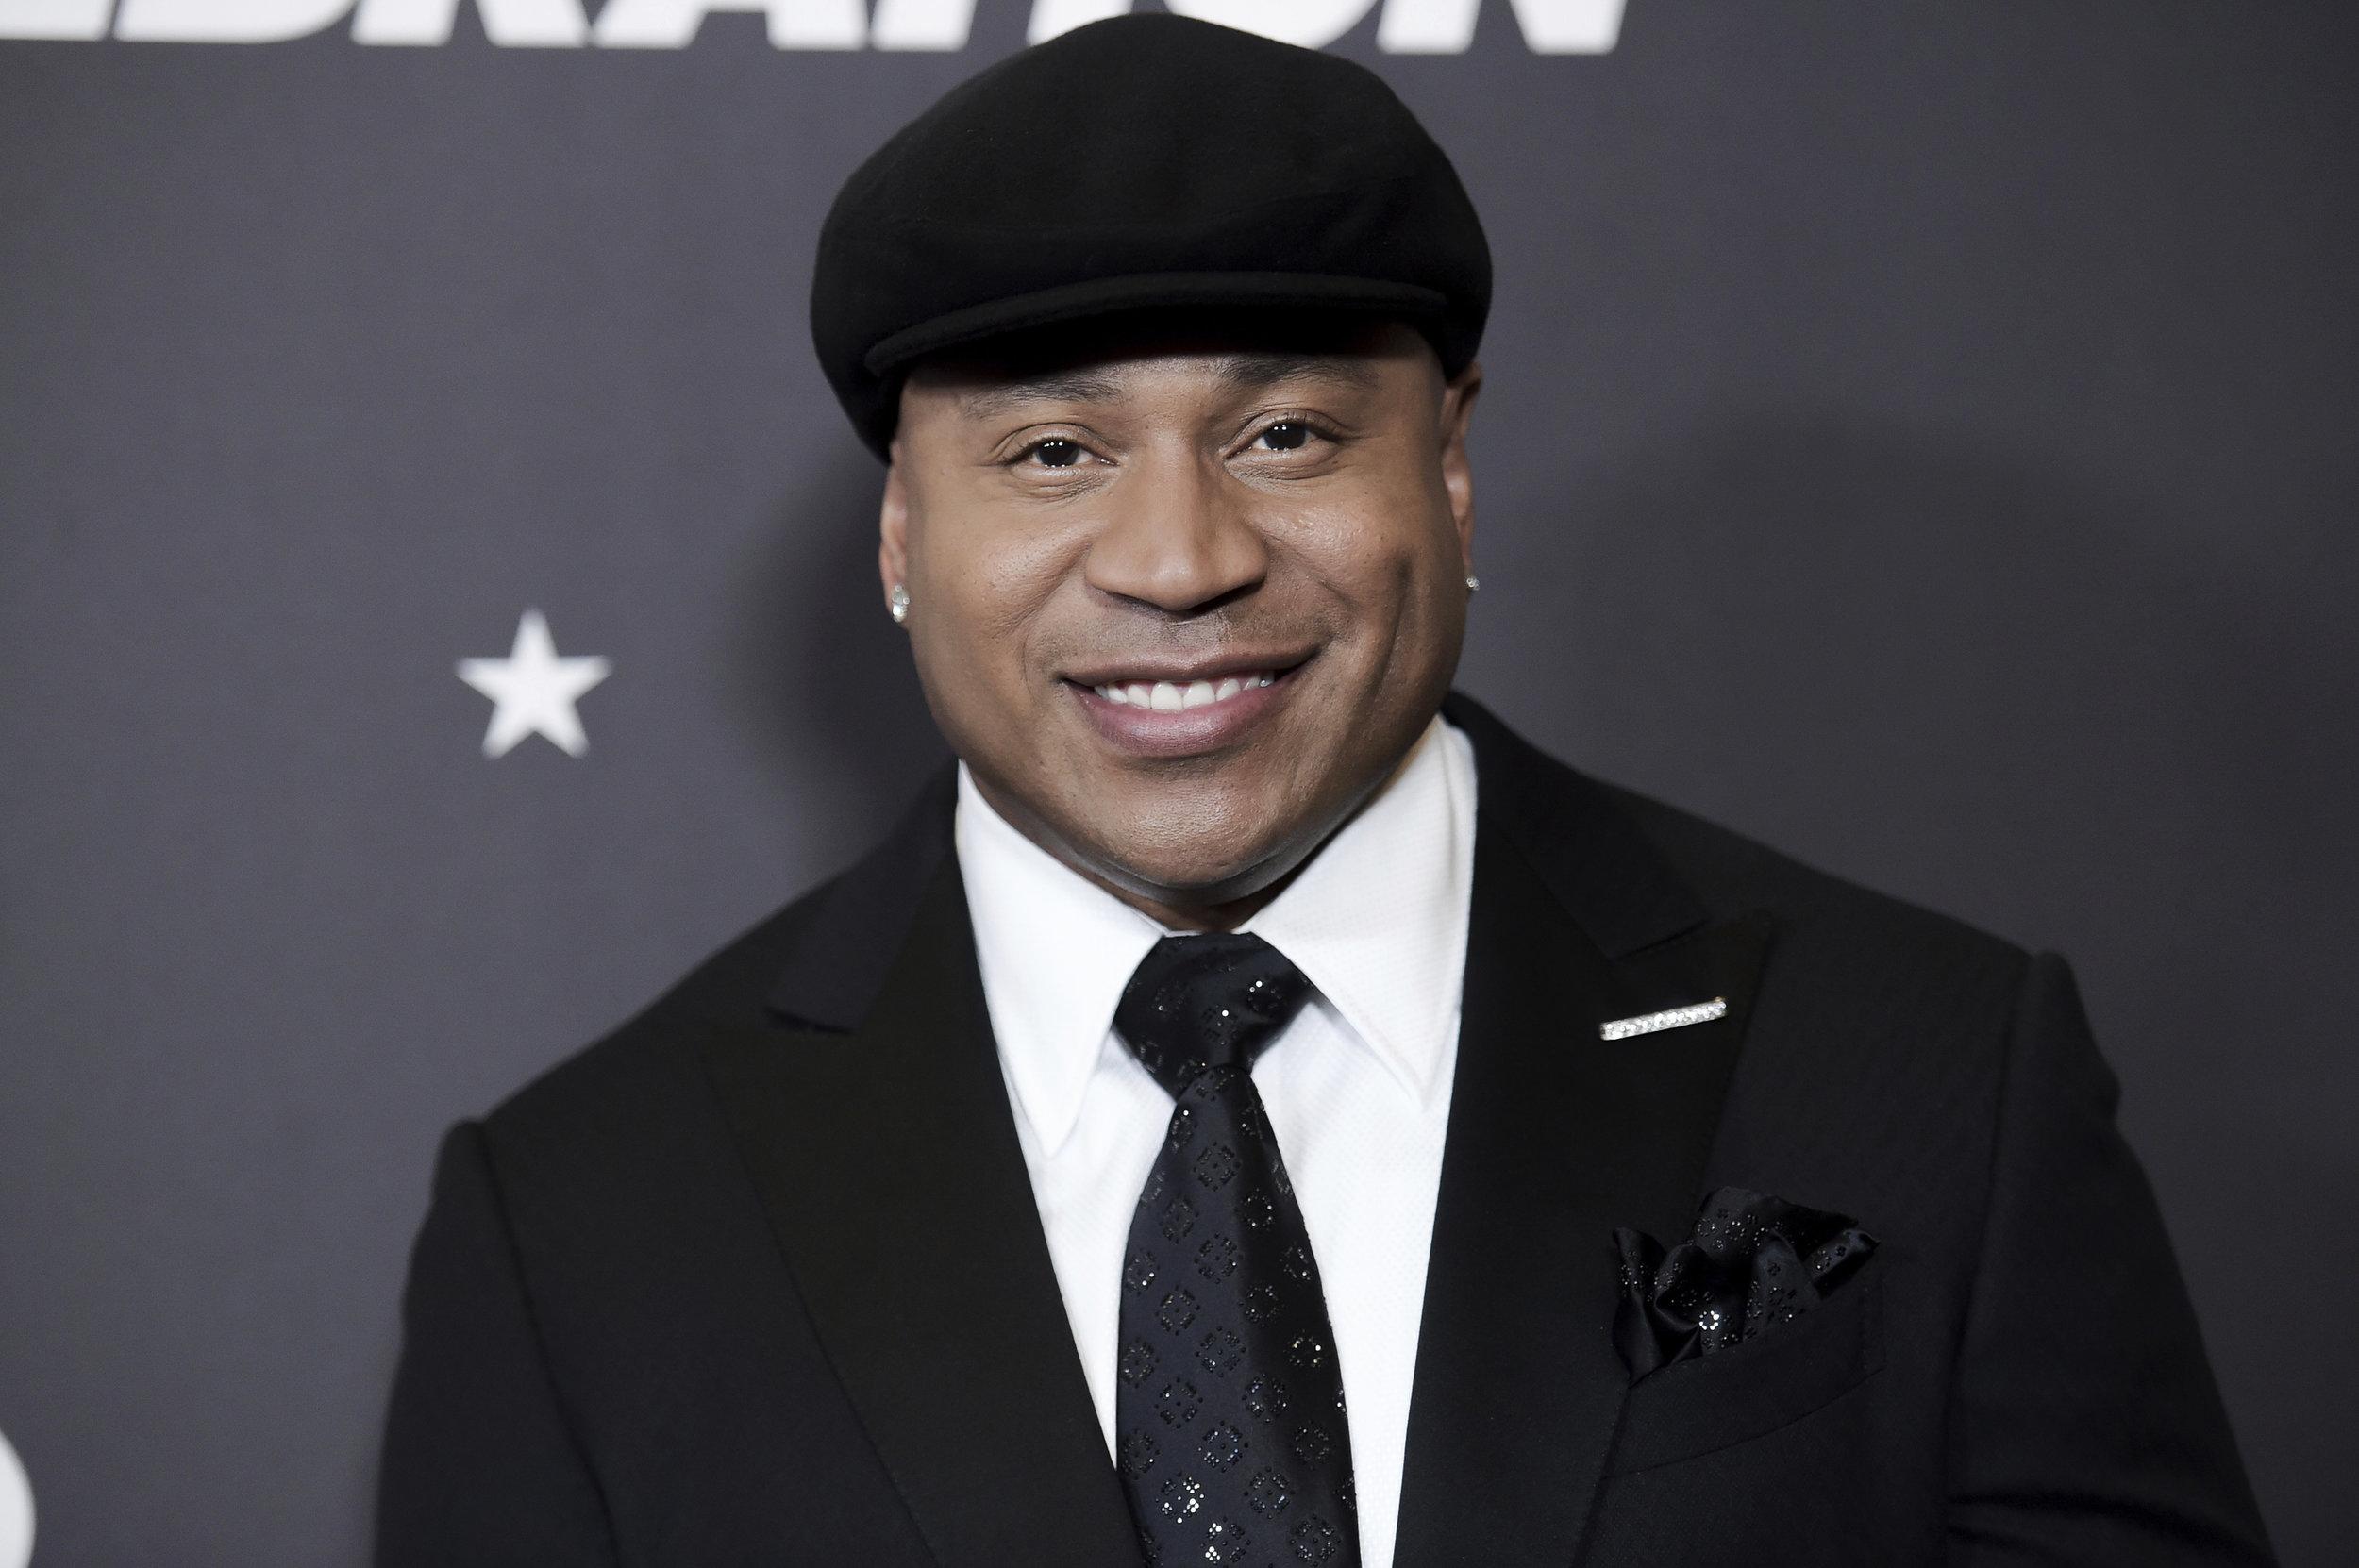 LL Cool J Photo courtesy of Richard Shotwell/Invision/AP